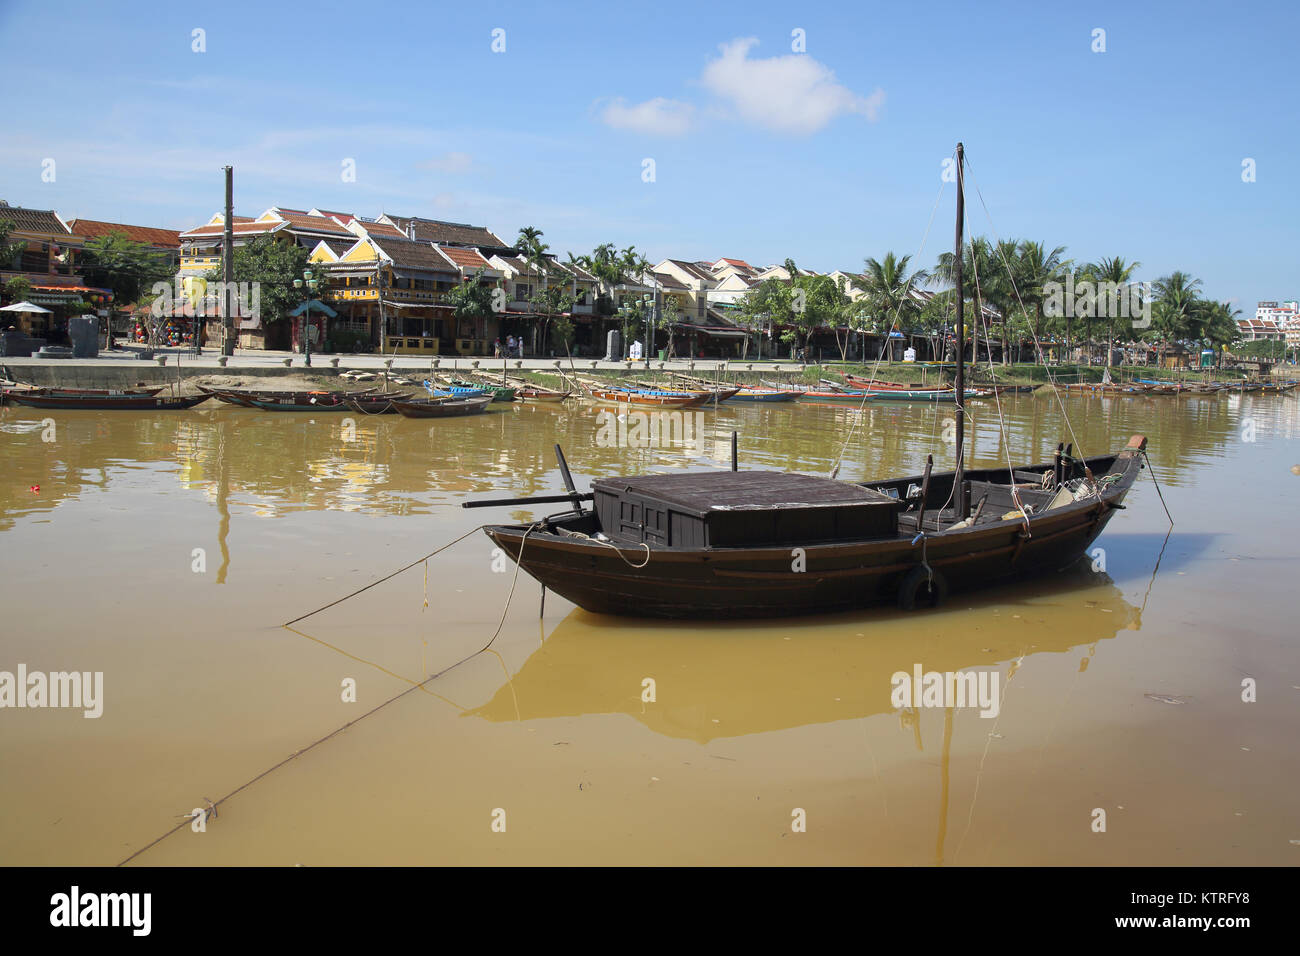 La rivière thu bon circulant dans hoi An vietnam Photo Stock